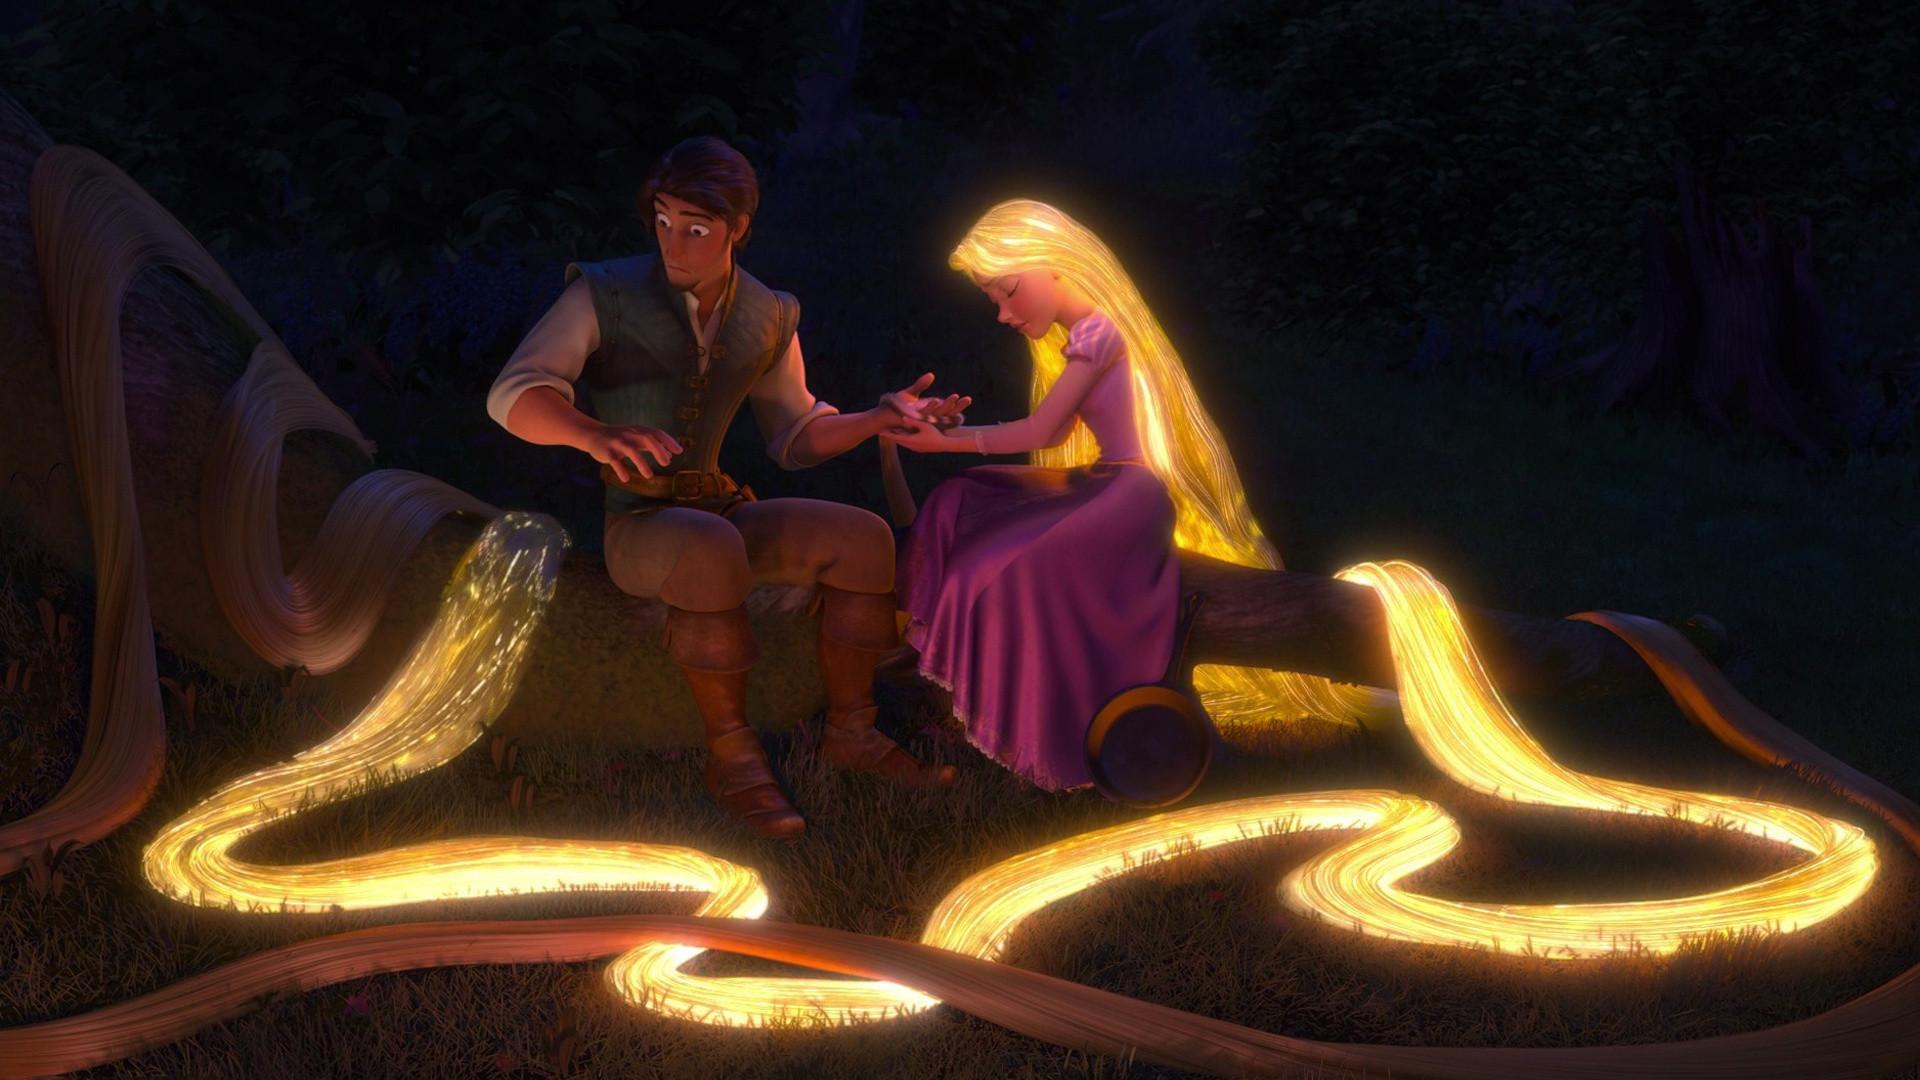 Rapunzel Wallpaper HD (70  images) for Tangled Wallpaper Rapunzel And Flynn  183qdu